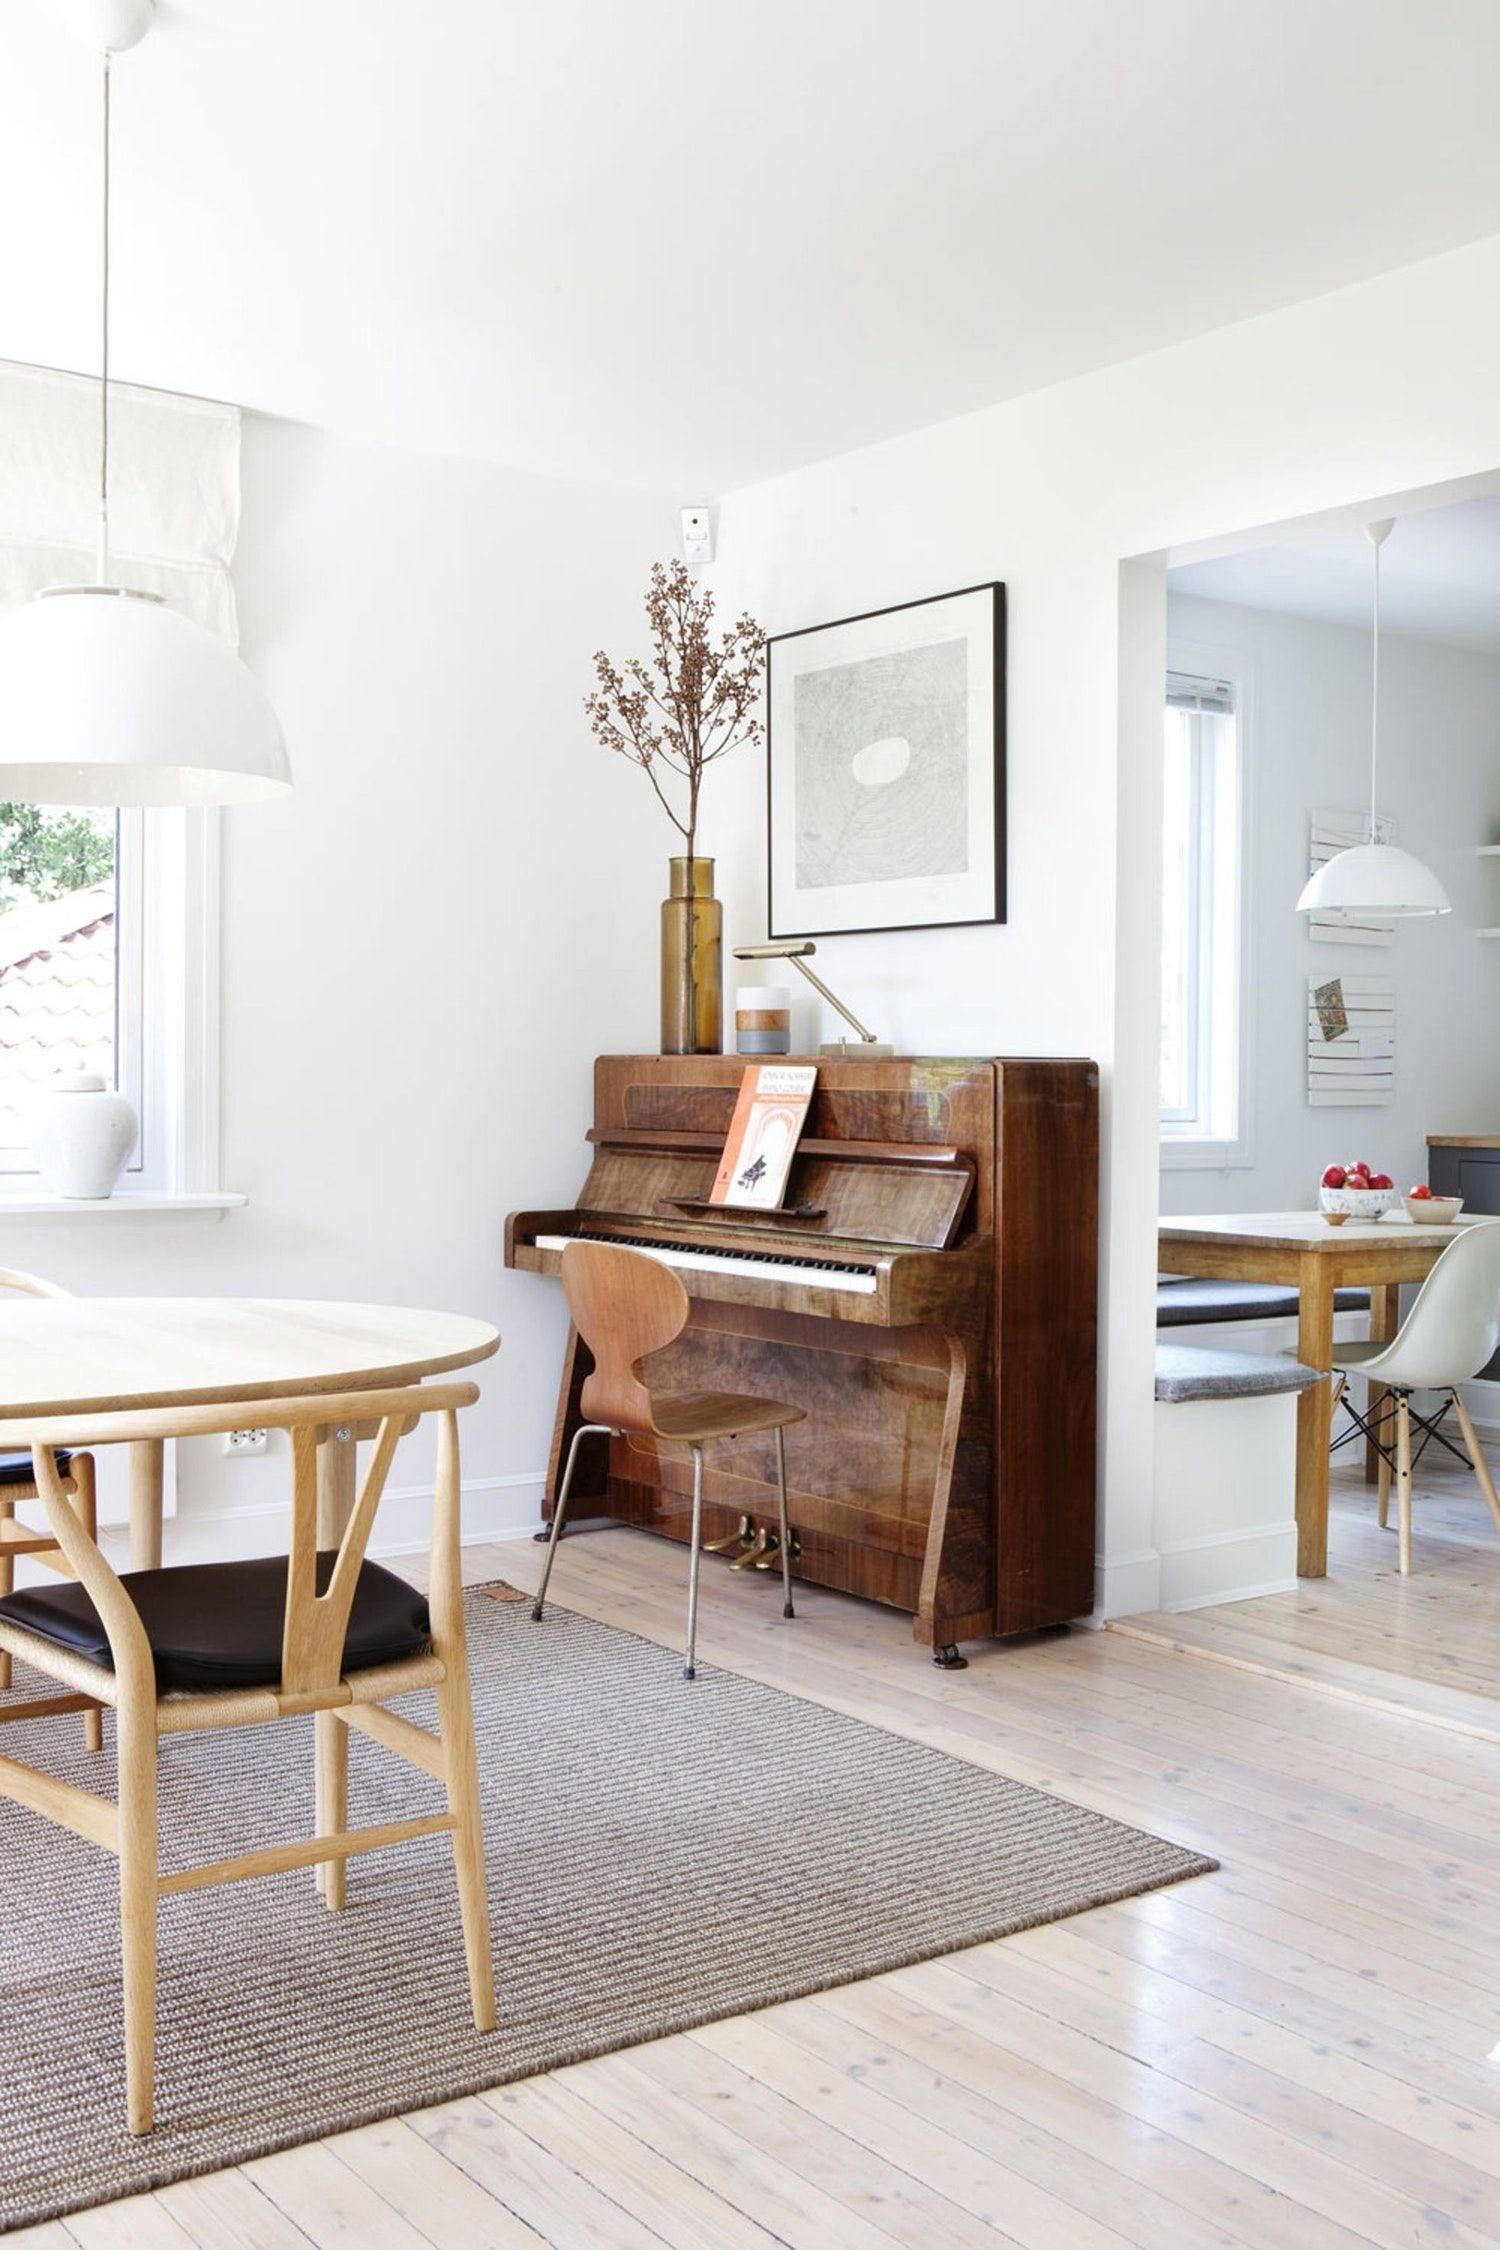 le piano, objet déco ? | alcôve | pinterest | piano, deco and piano